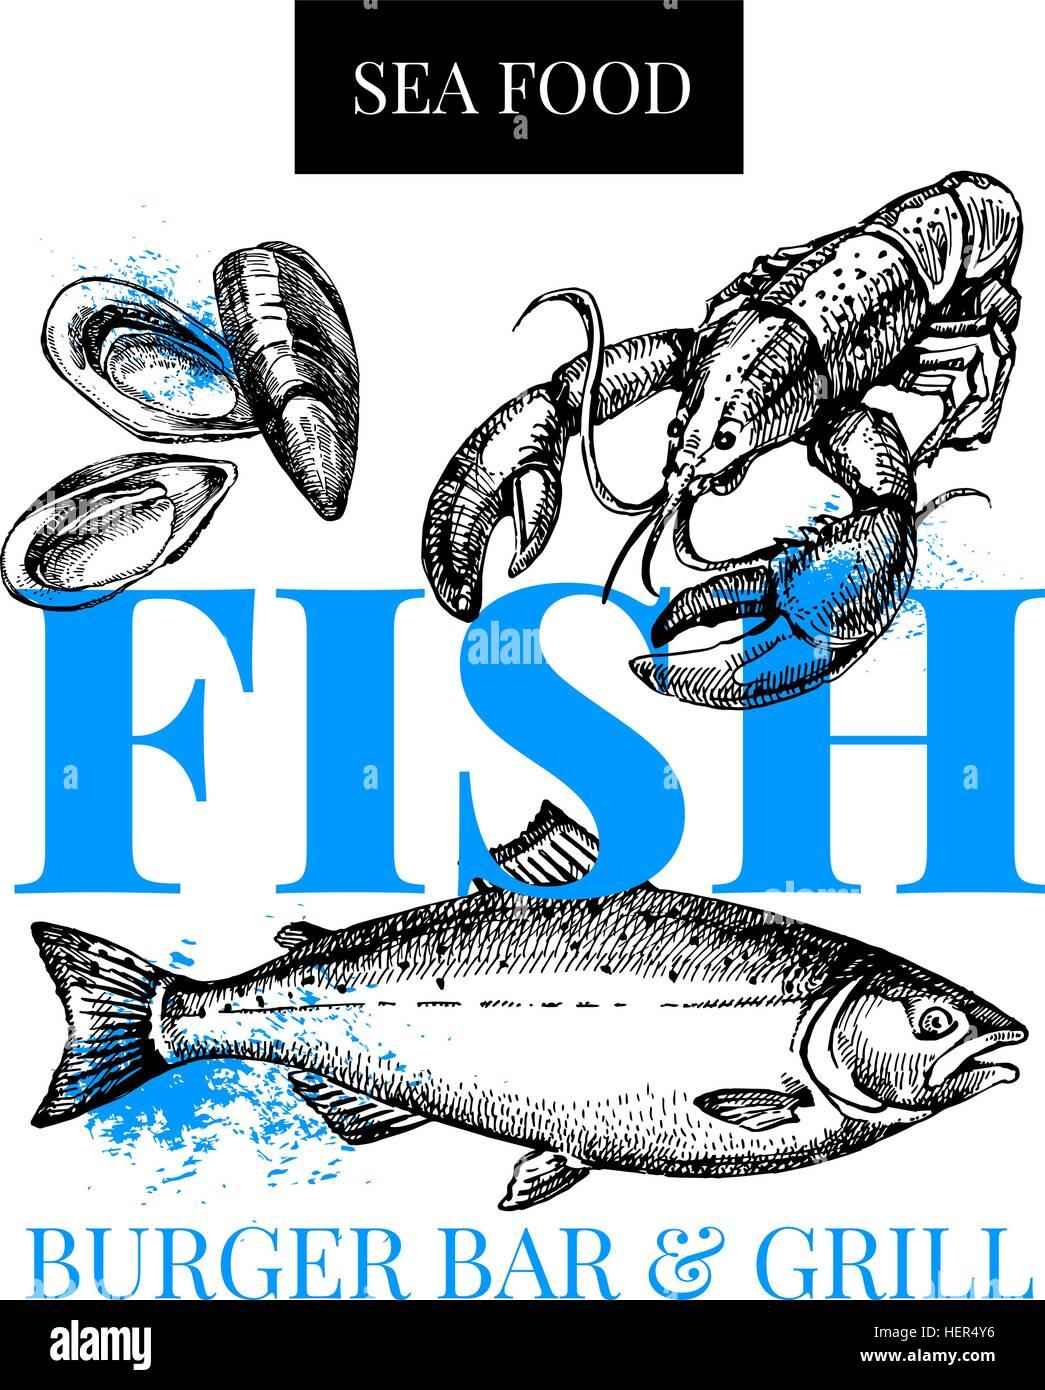 Restaurant Fresh Sea Food Menu Fish Market Poster Hand Drawn Sketch Stock Vector Image Art Alamy